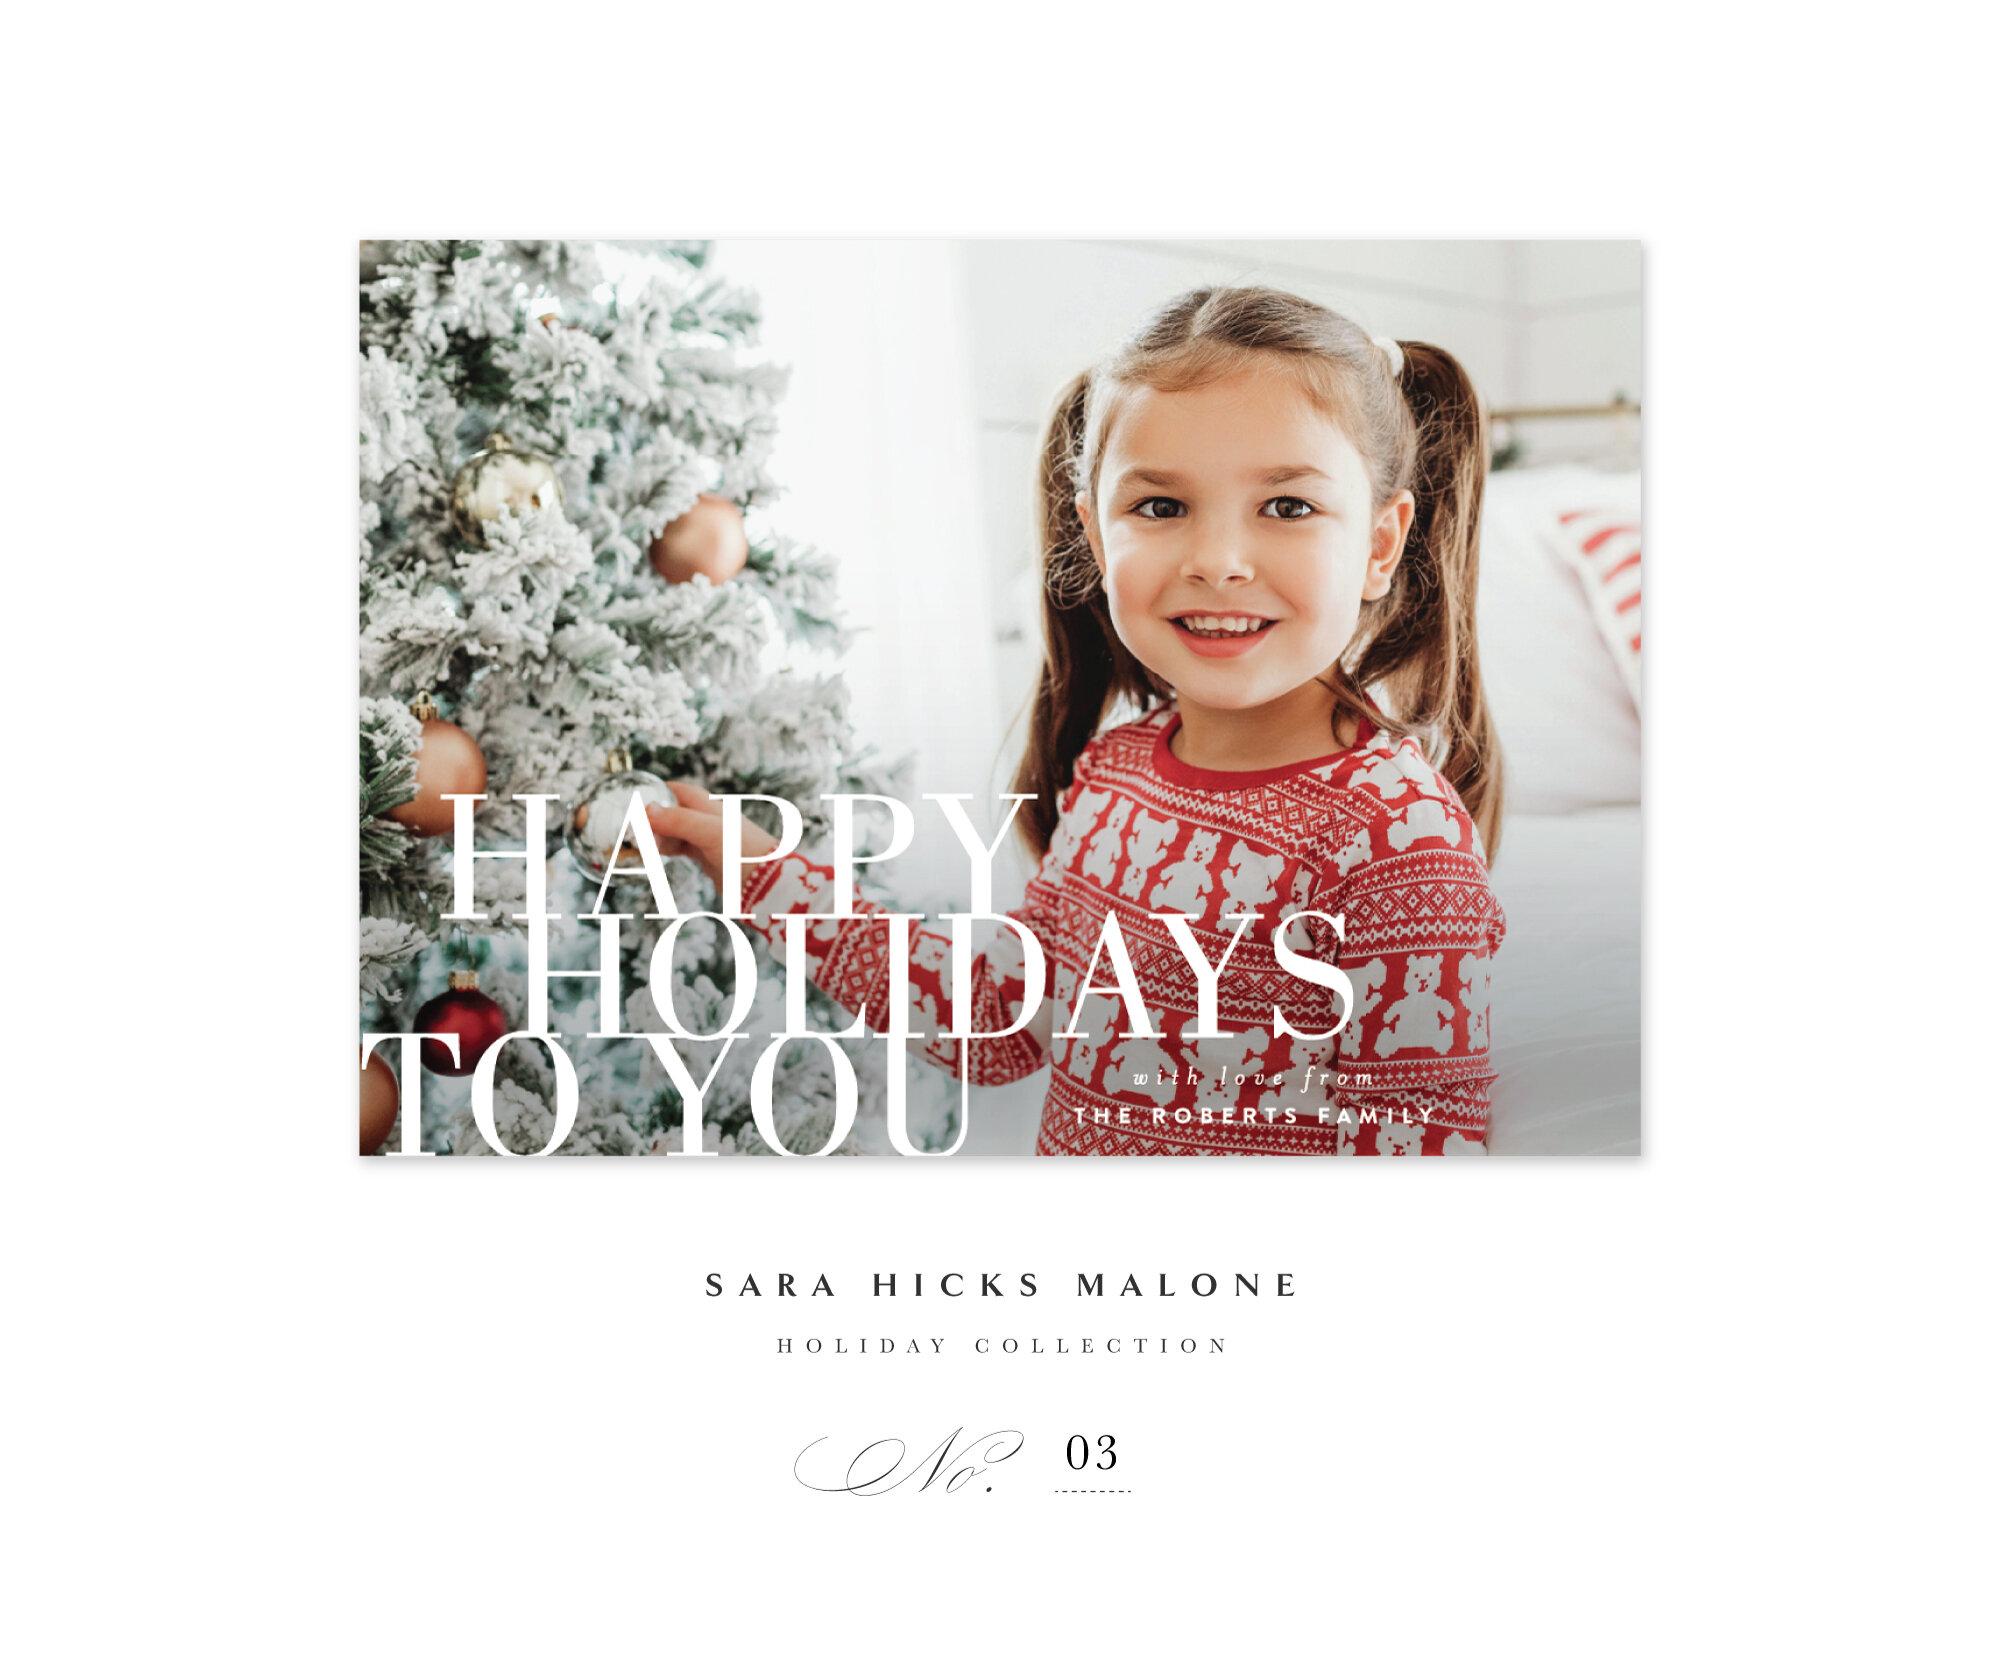 'Happy Holidays to You' by Sara Hicks Malone